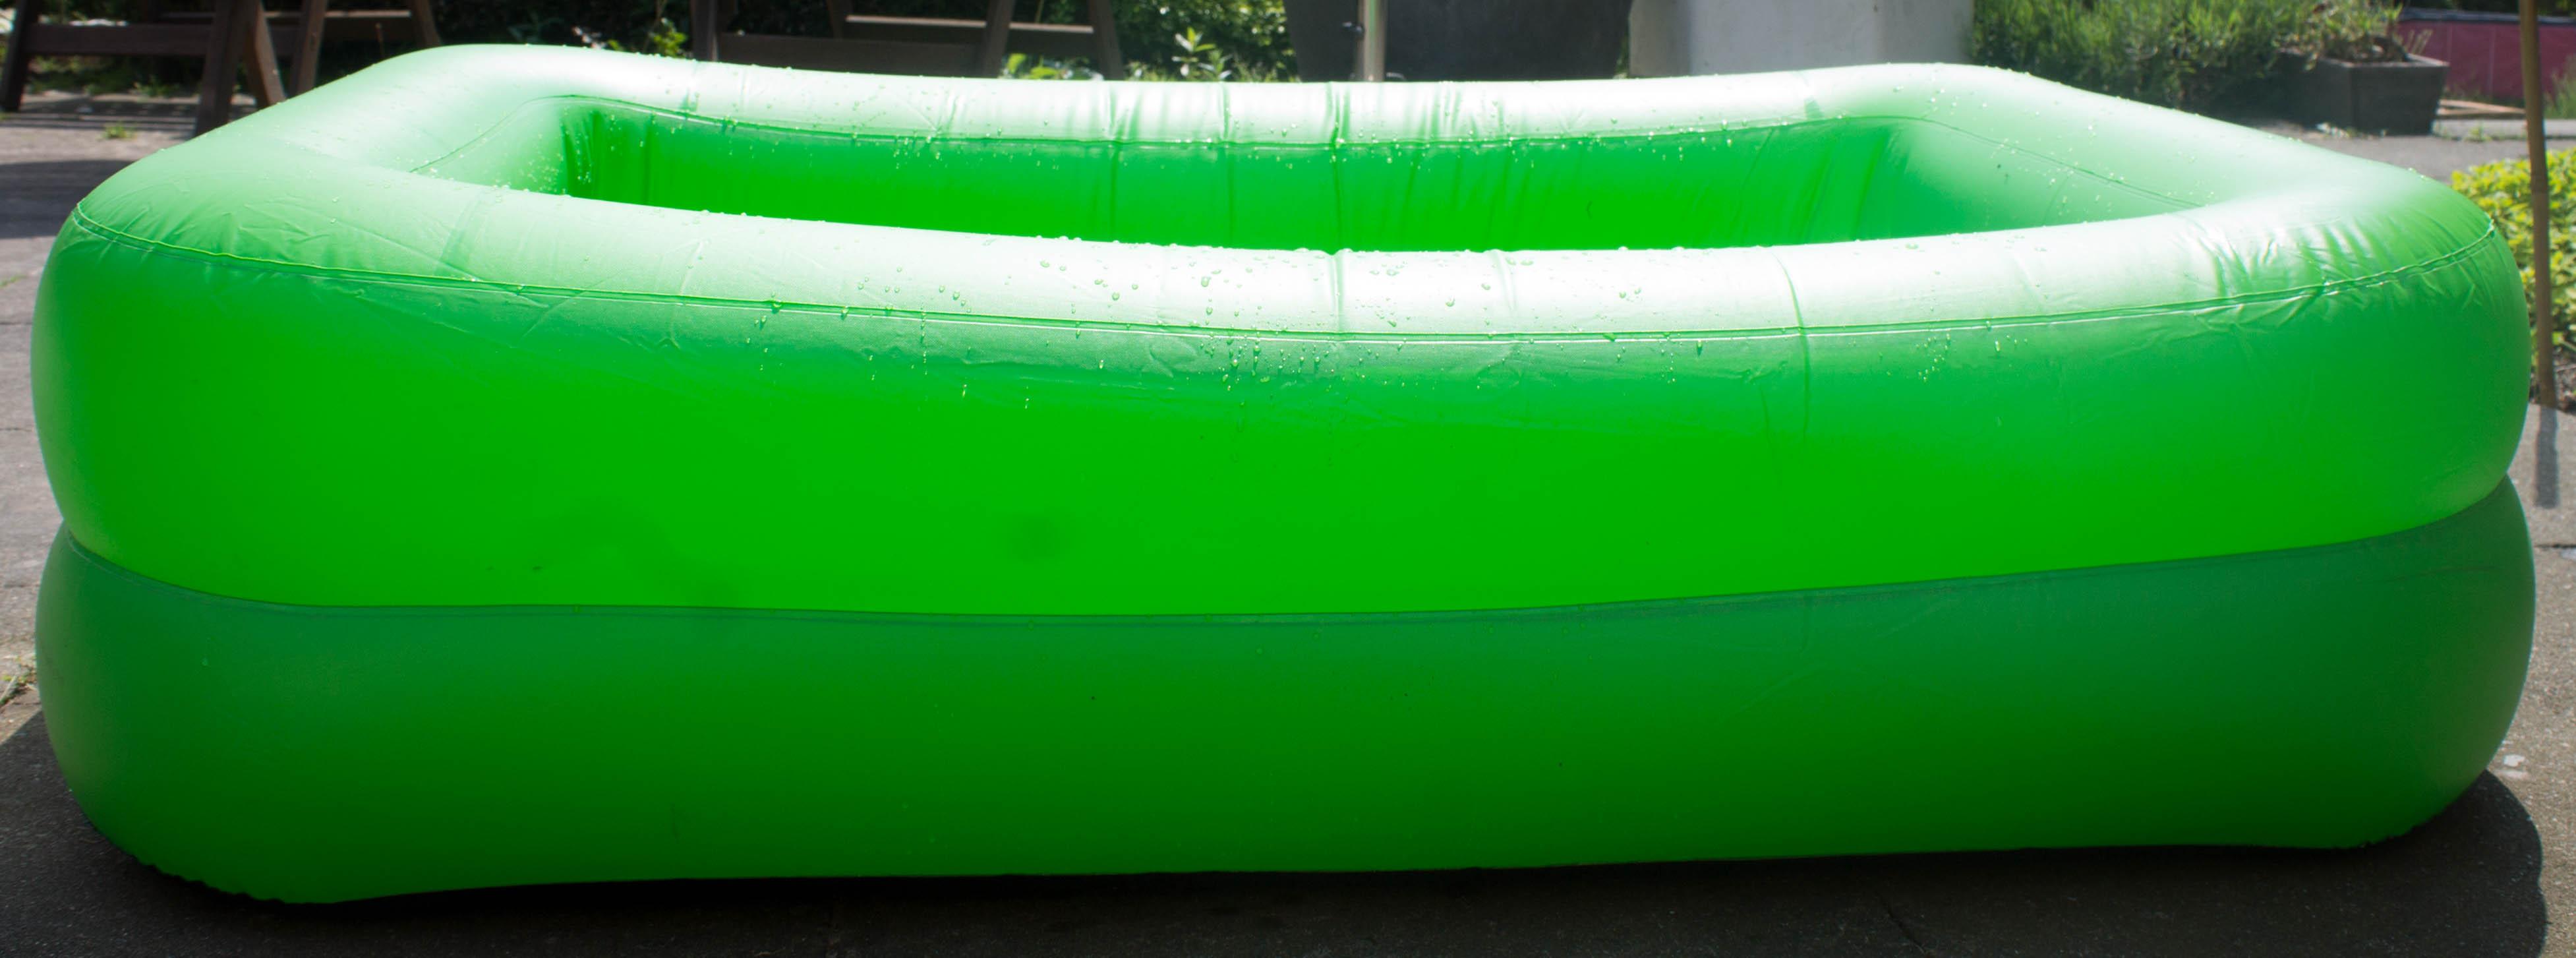 solar pool planschbecken kinder babypool schwimmbecken mit abdeckung ebay. Black Bedroom Furniture Sets. Home Design Ideas